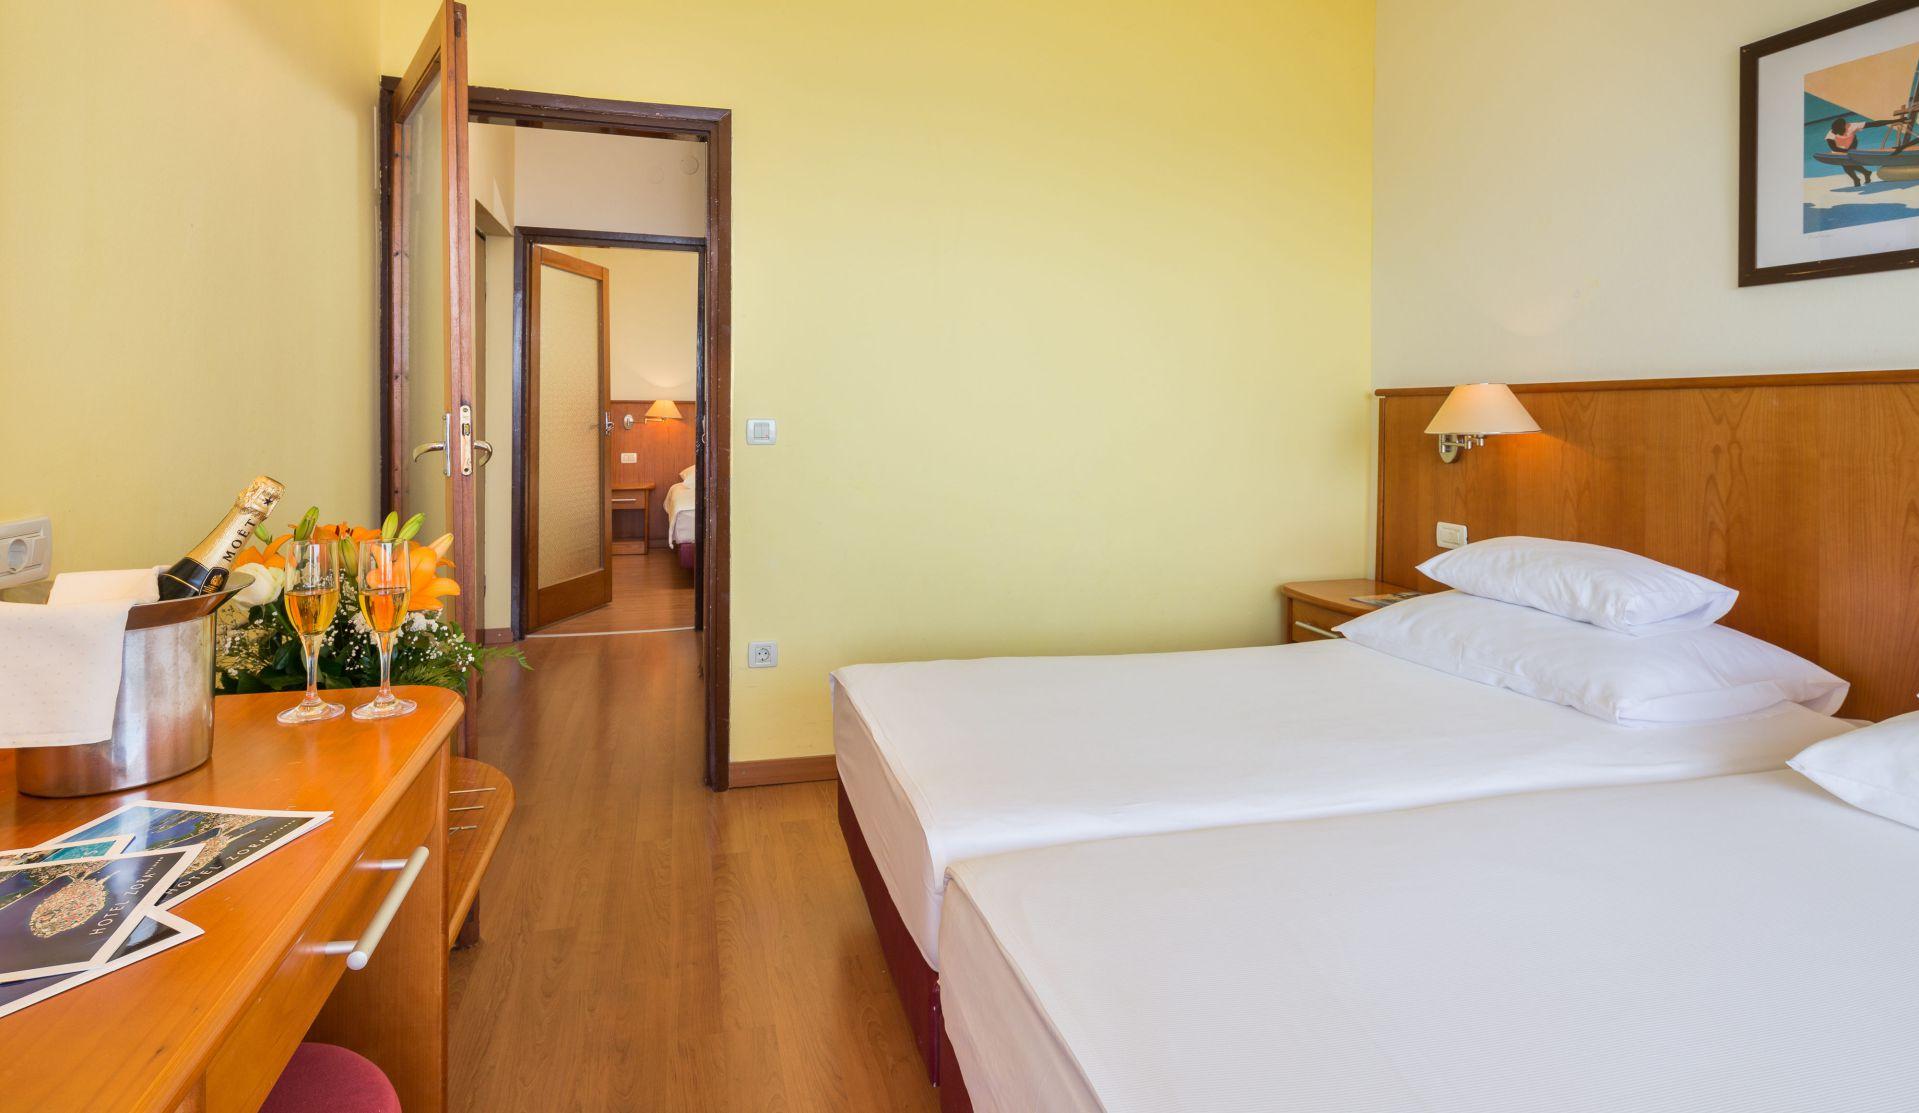 comfort family room 04 14825404595 o - Zora Hotel